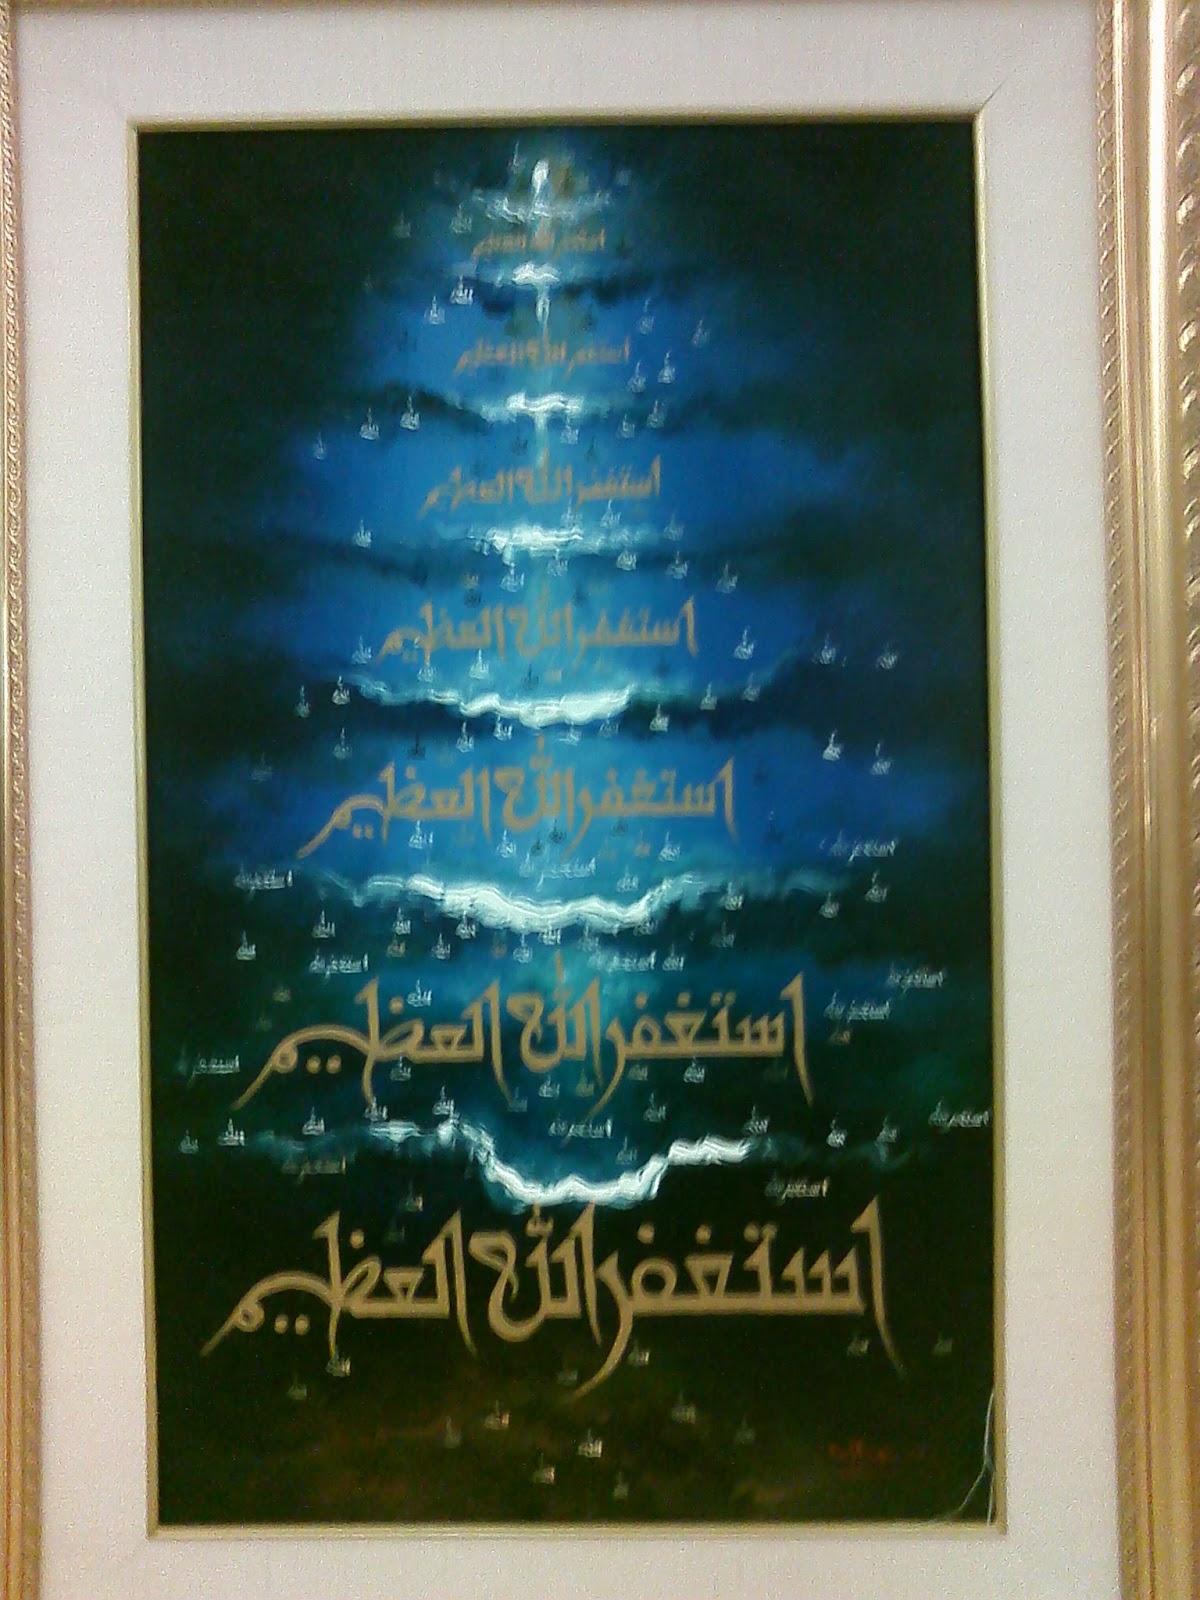 kaligrafi arab I Islam Kaligrafi I Lukisan kaligrafi I